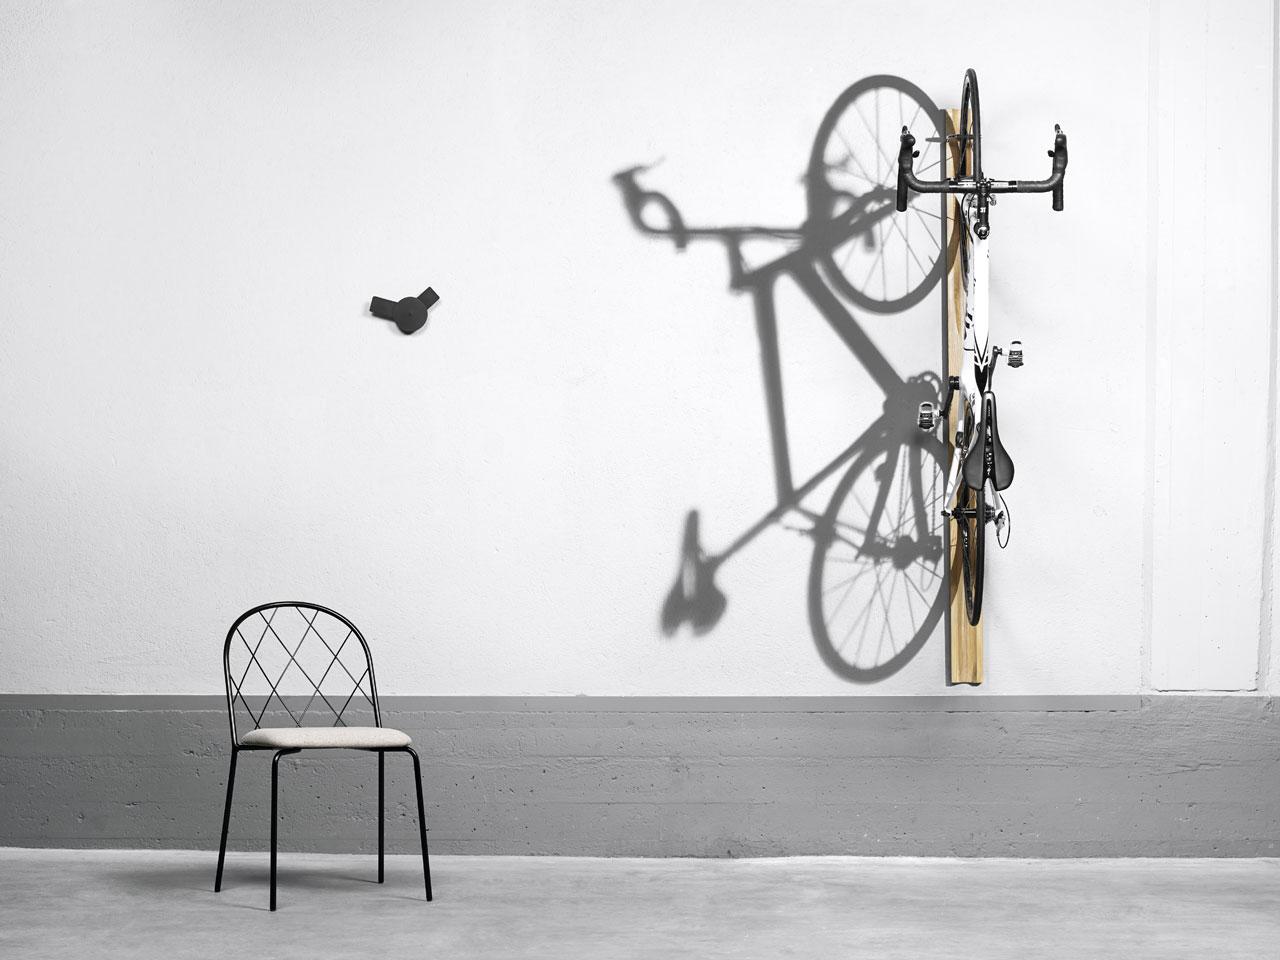 Meshchair byLars Hofsjö,O´clock wall clock byLouise Hederström andGirowall-mounted cycle rack byMattias Stenberg for David Design.